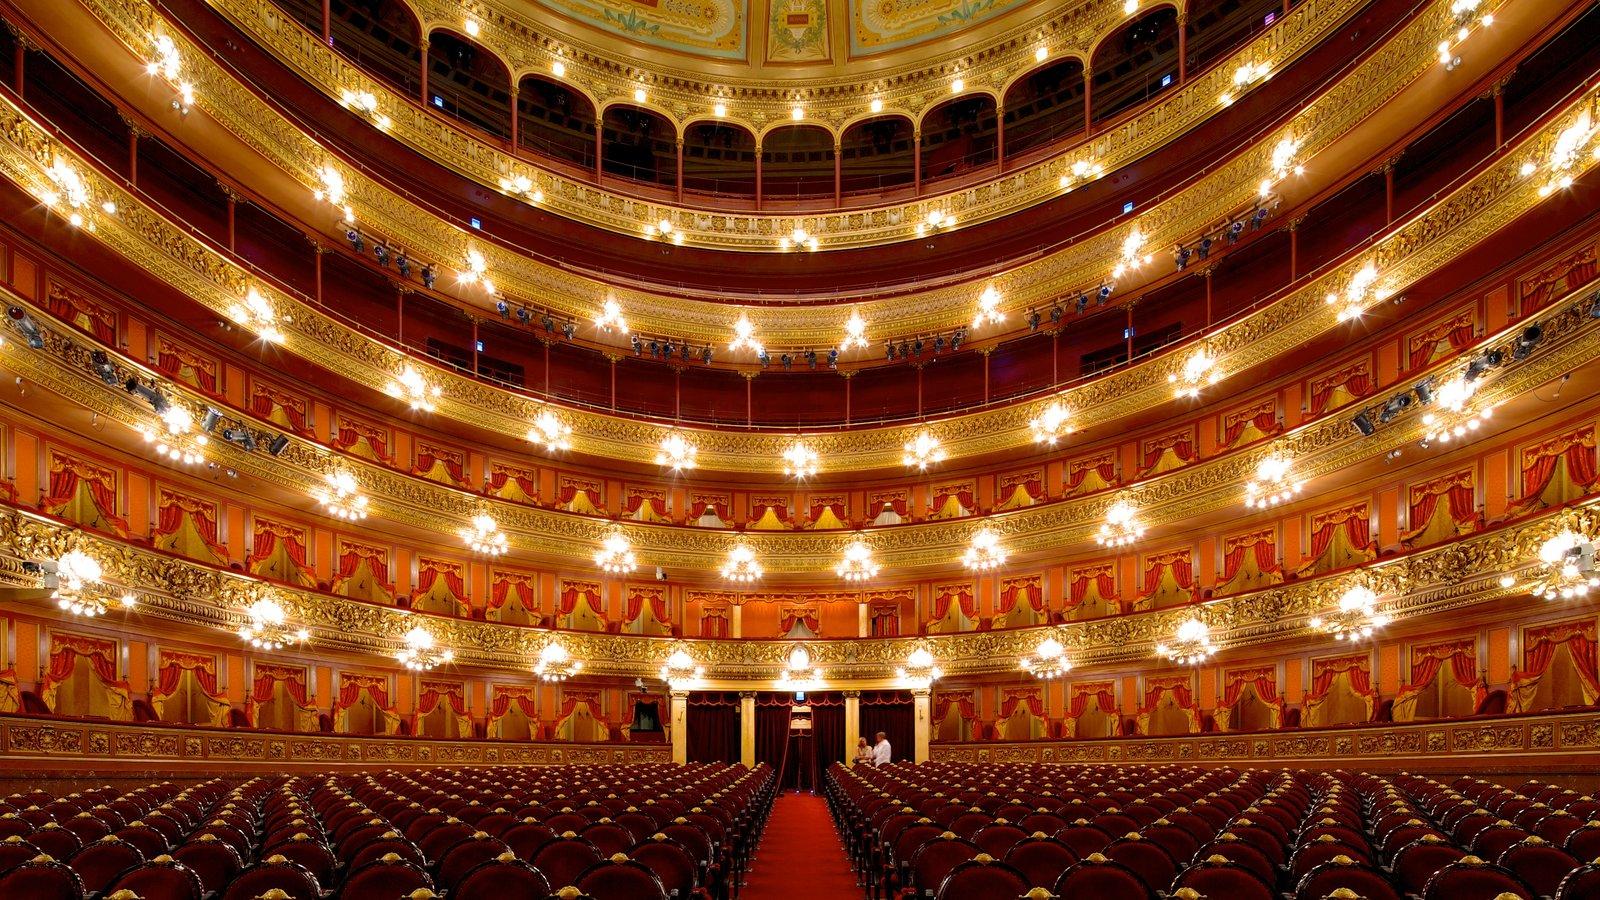 Teatro Colón mostrando cenas de teatro e vistas internas